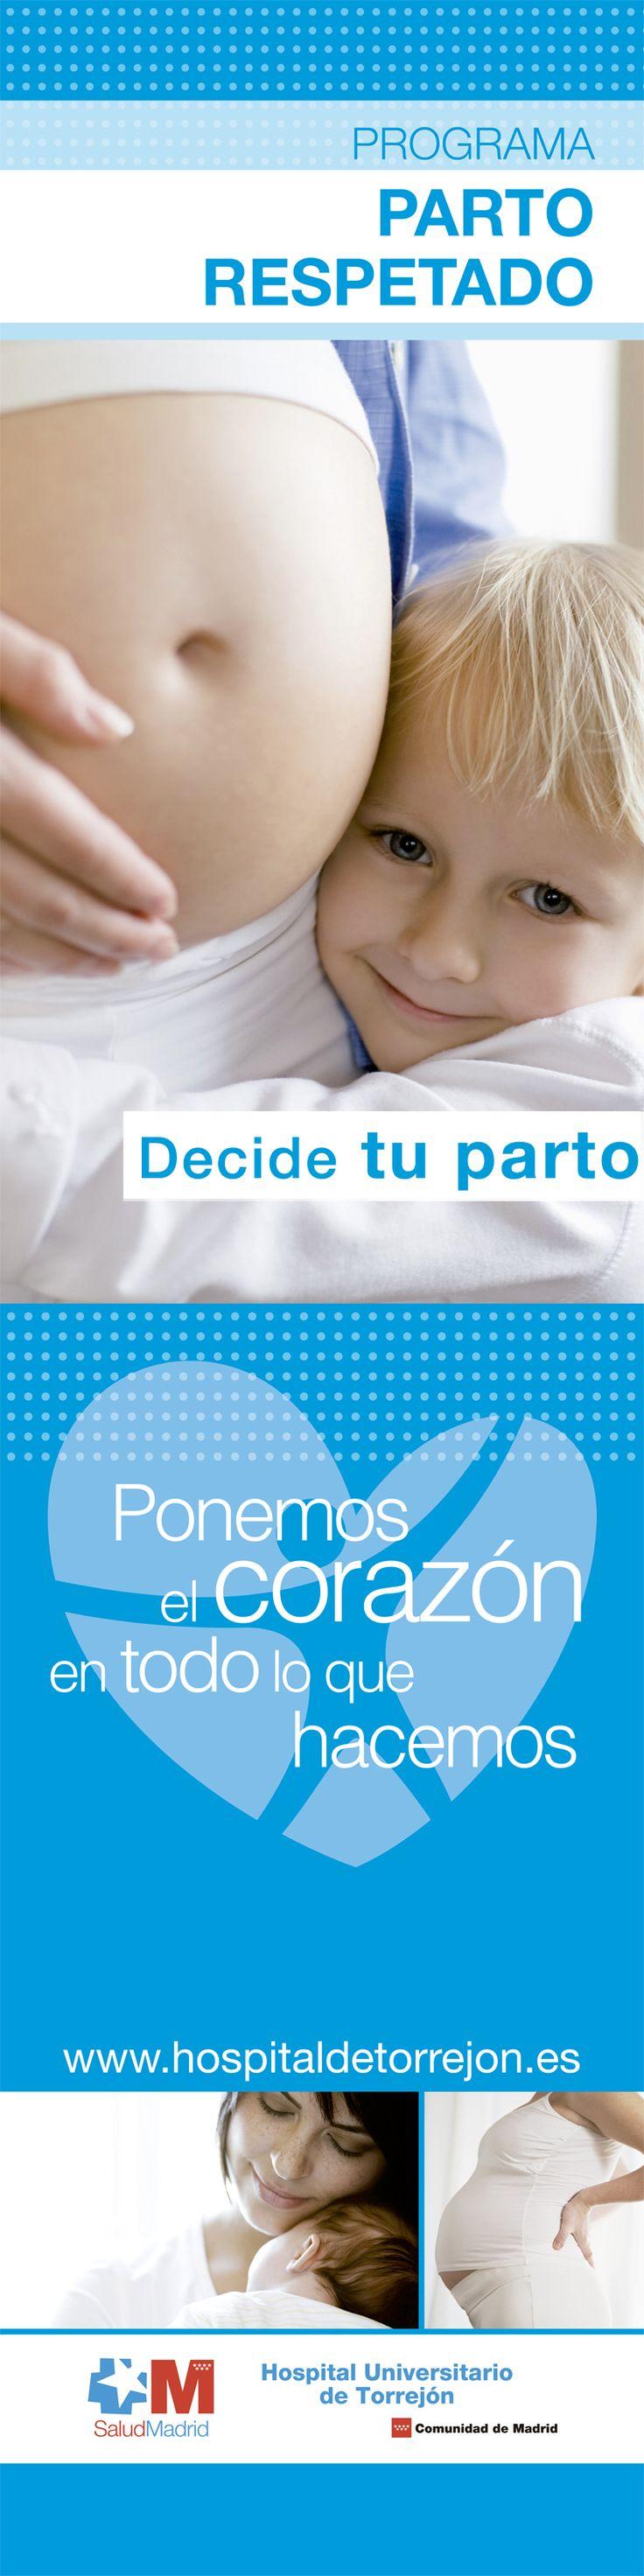 Programa Parto Respetado Hospital Torrejón